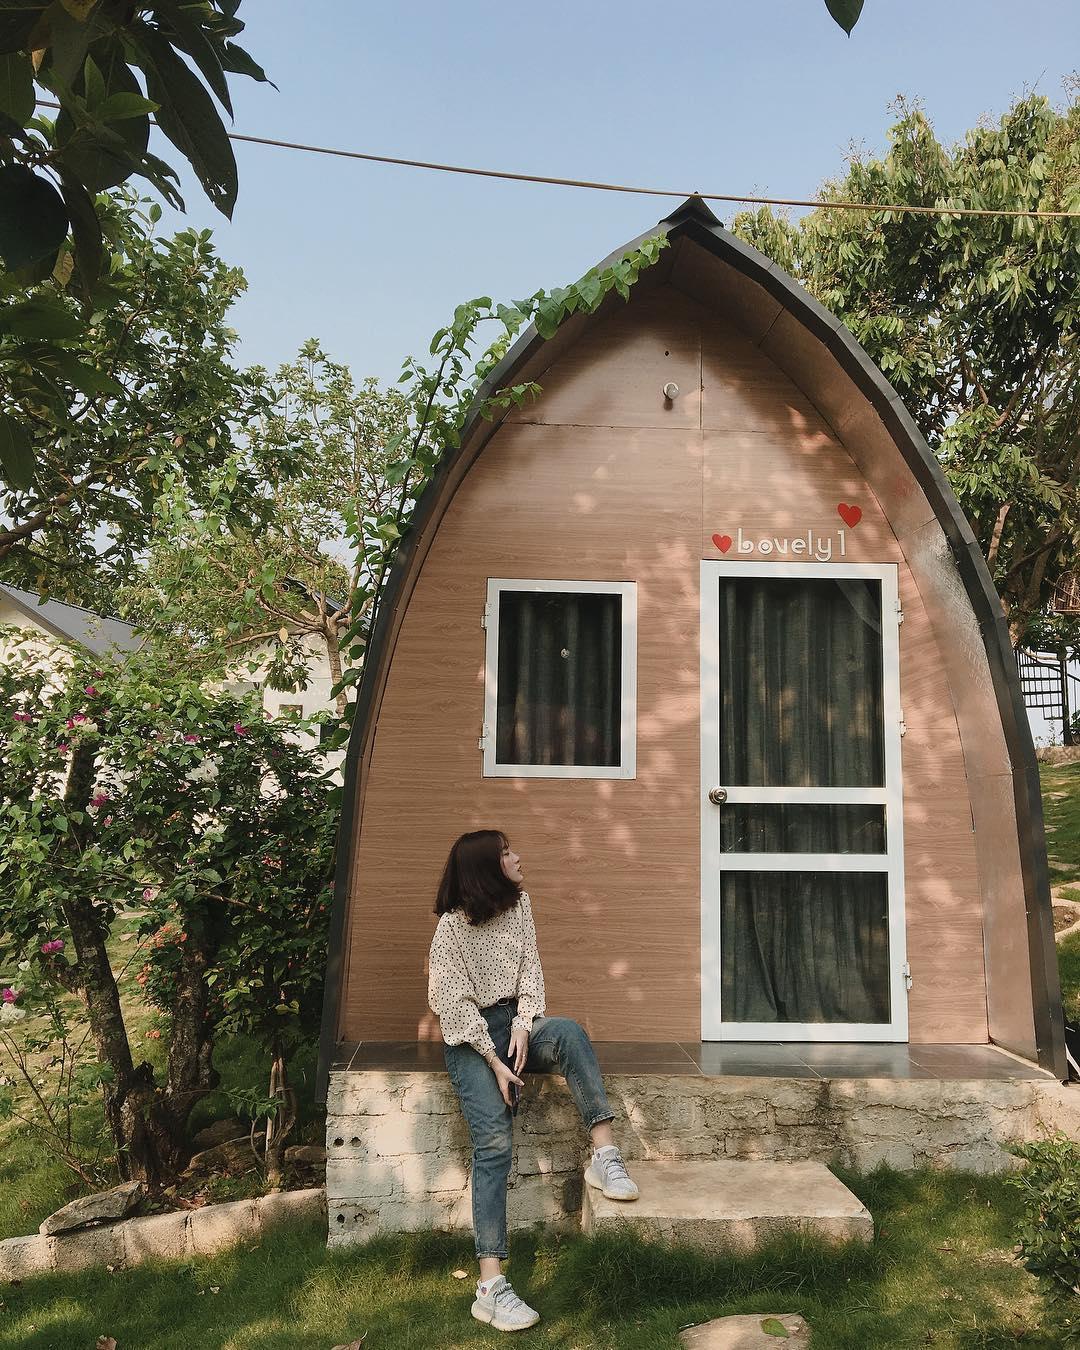 nha lovely 1 doi house